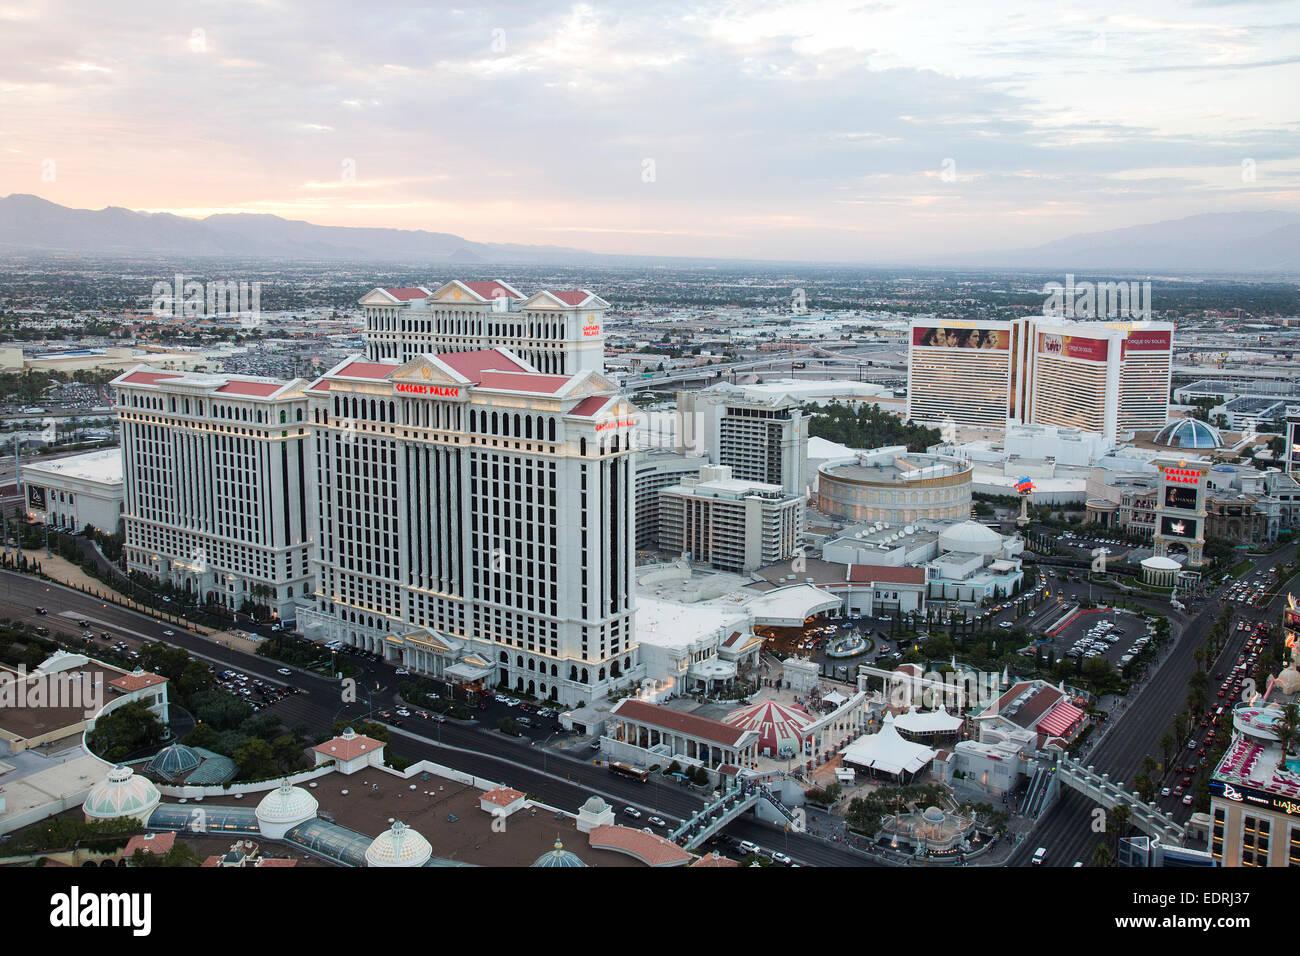 Caesars Palace Hotel and Casino on the Las Vegas Strip in Paradise, Nevada. - Stock Image